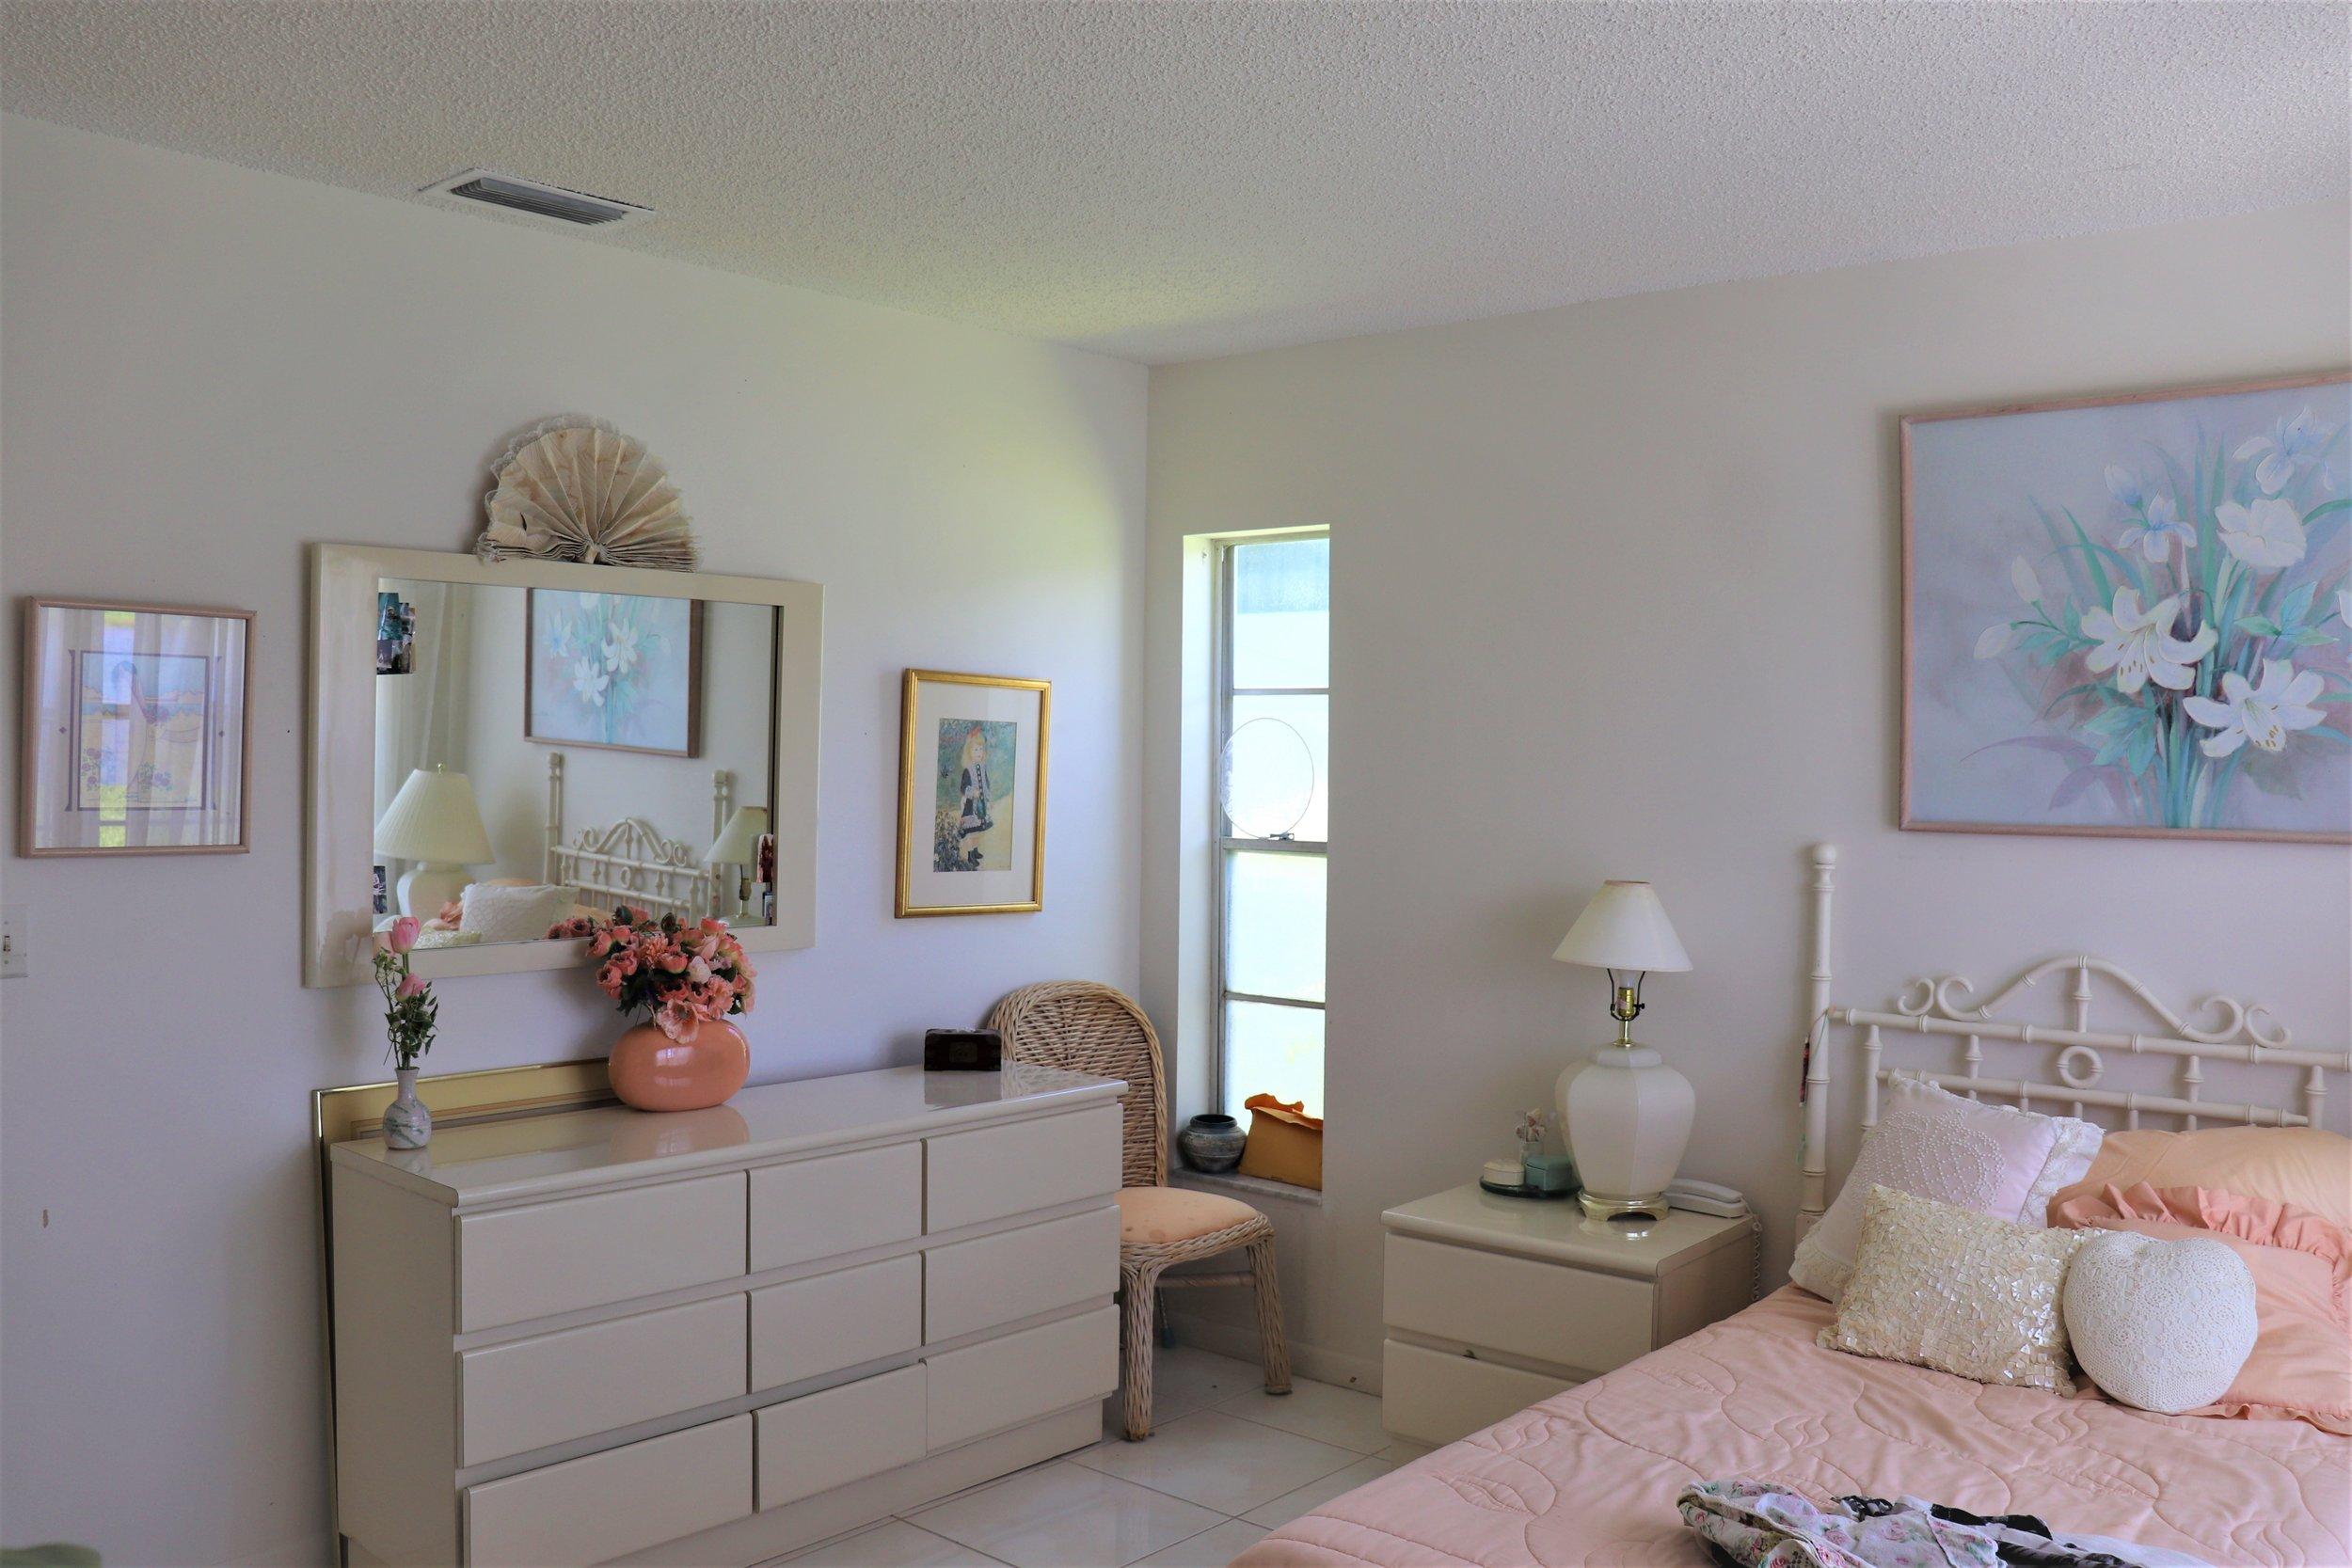 mater bedroom 3.JPG